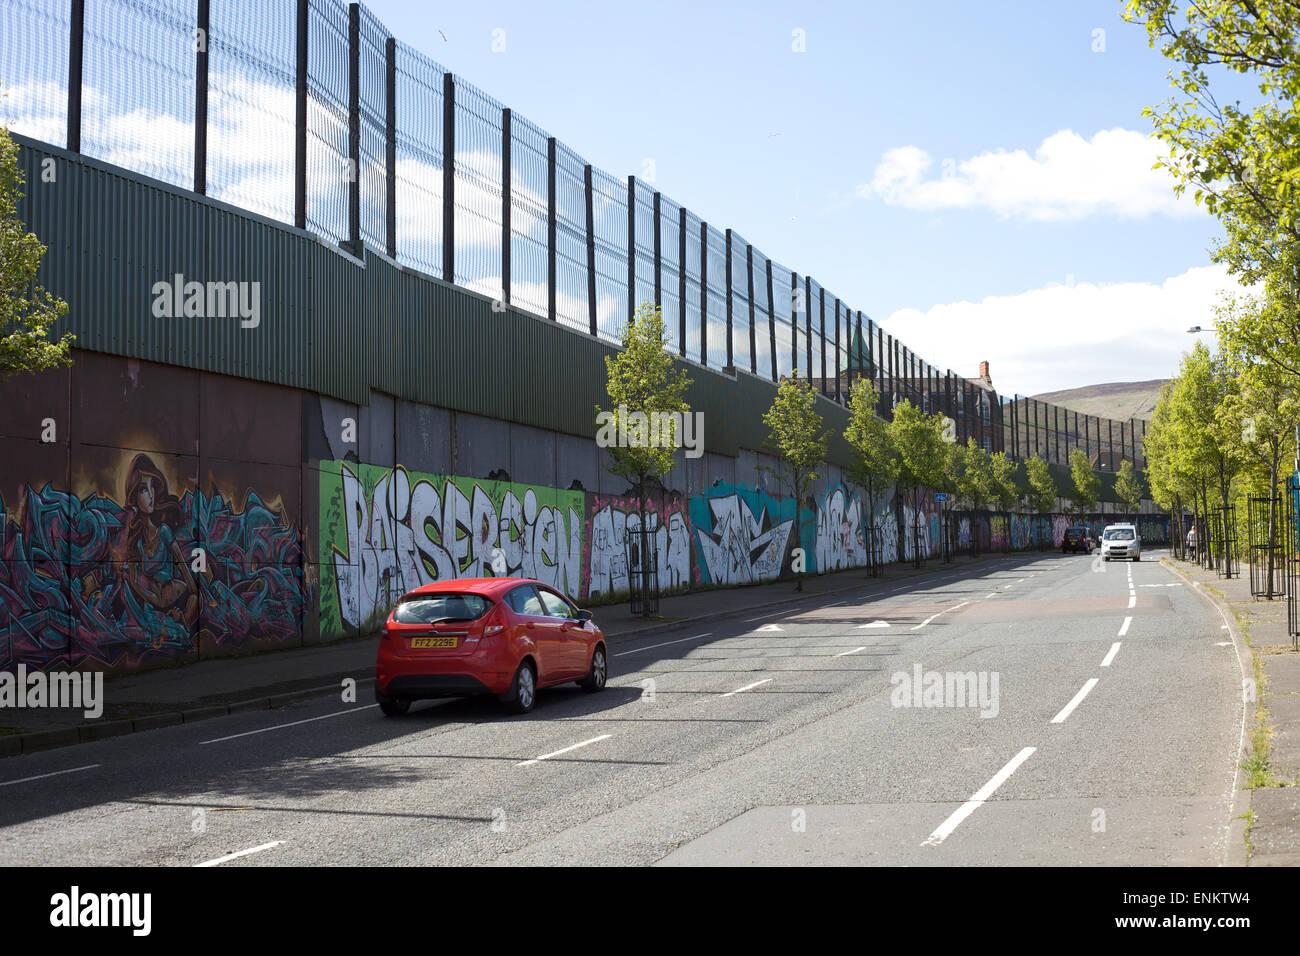 Peace Wall, Shankill Road, Belfast, Northern Ireland - Stock Image